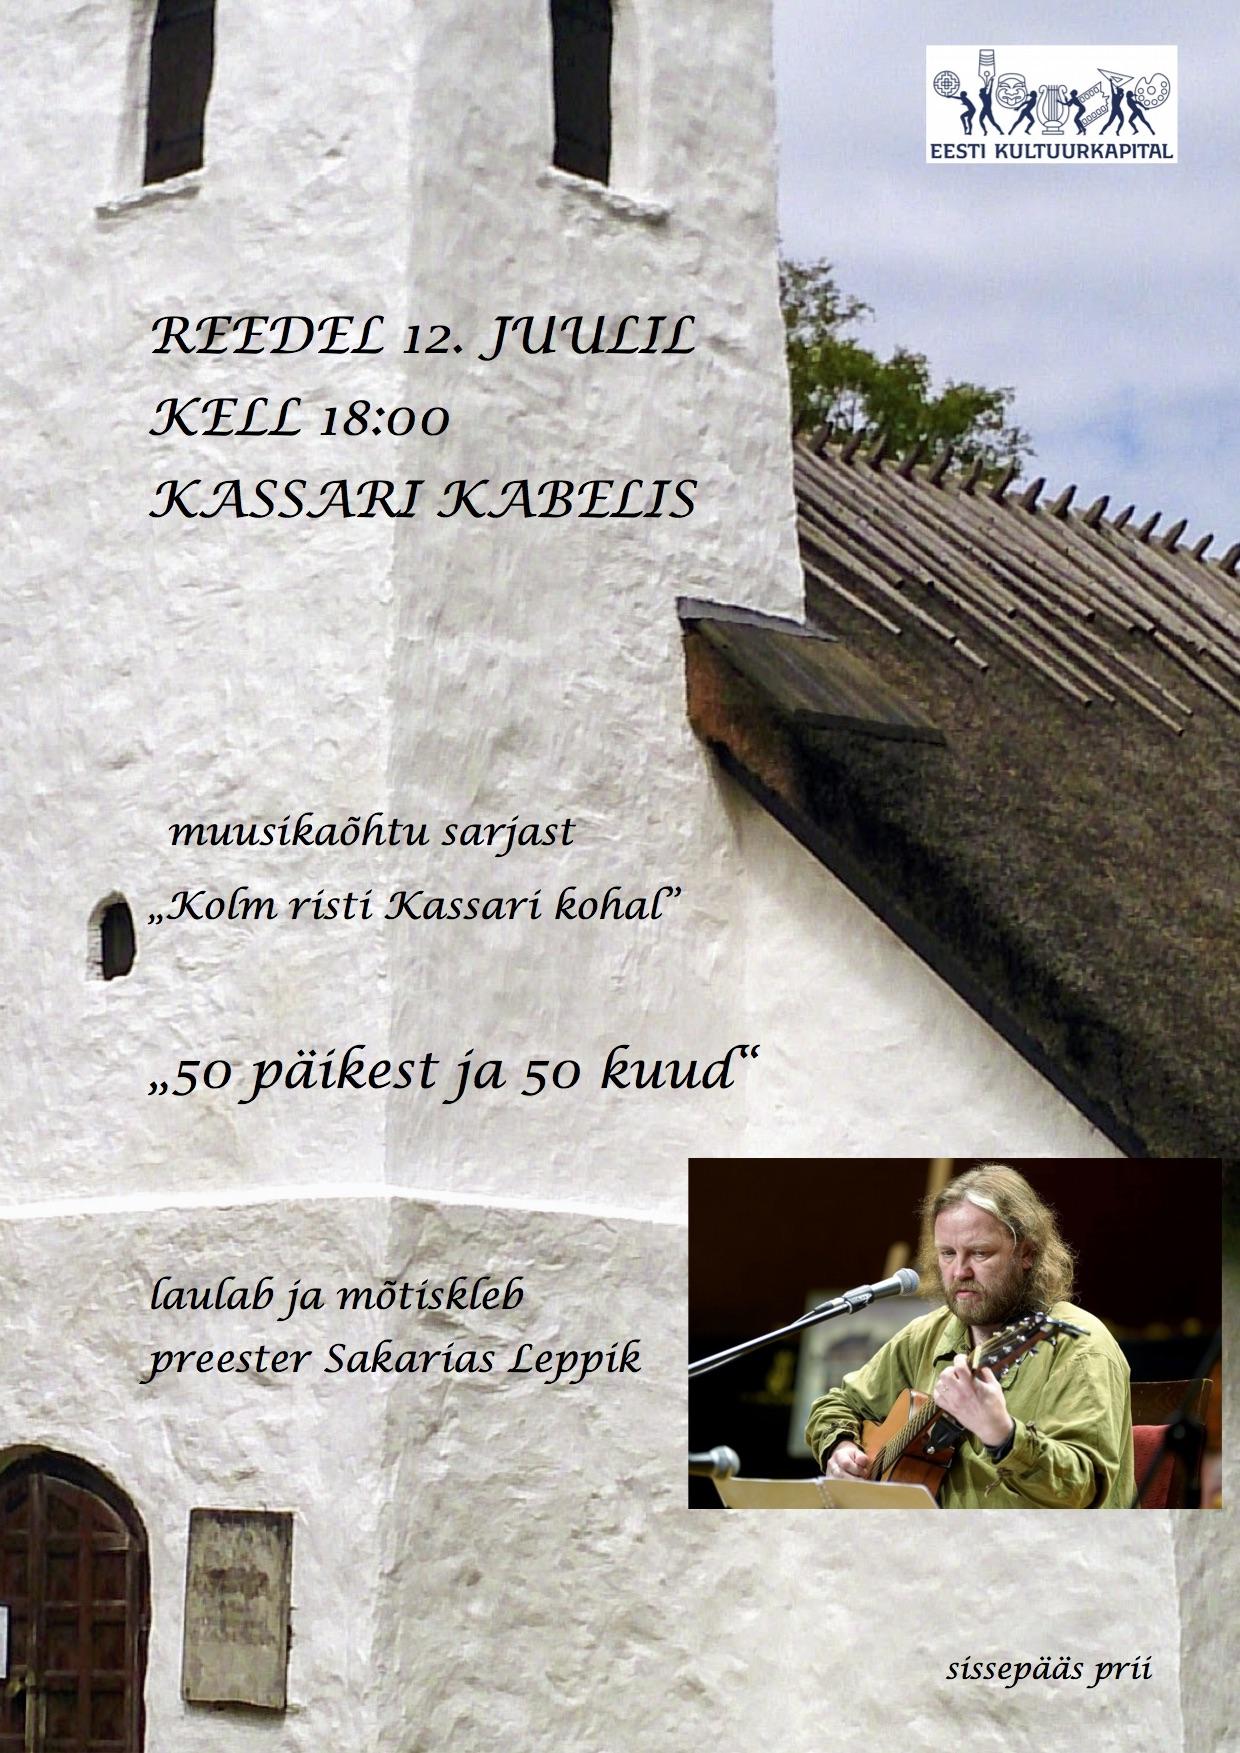 Kolm-risti-Kassari-kohal-copy